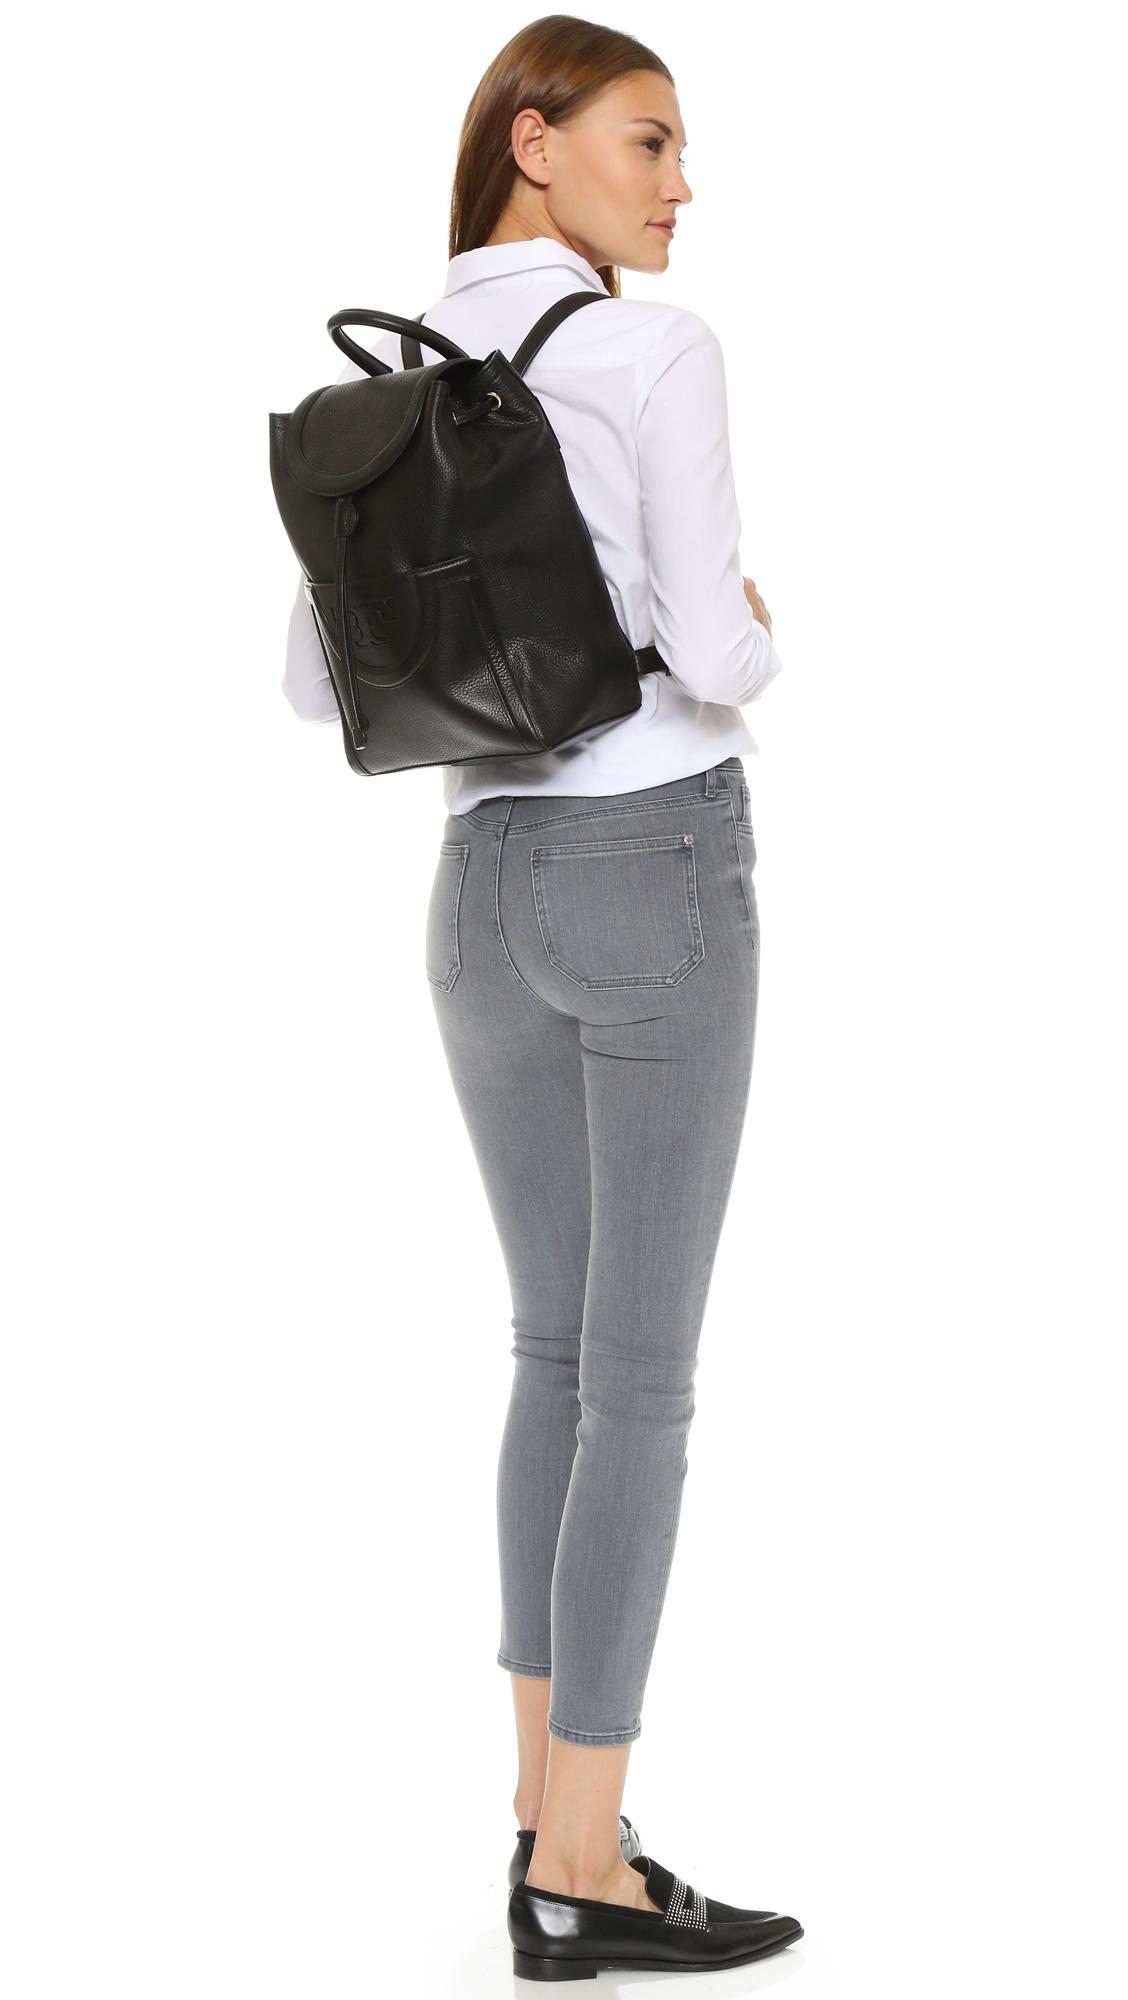 5e0cc09f8b22 Tory Burch Serif T Backpack